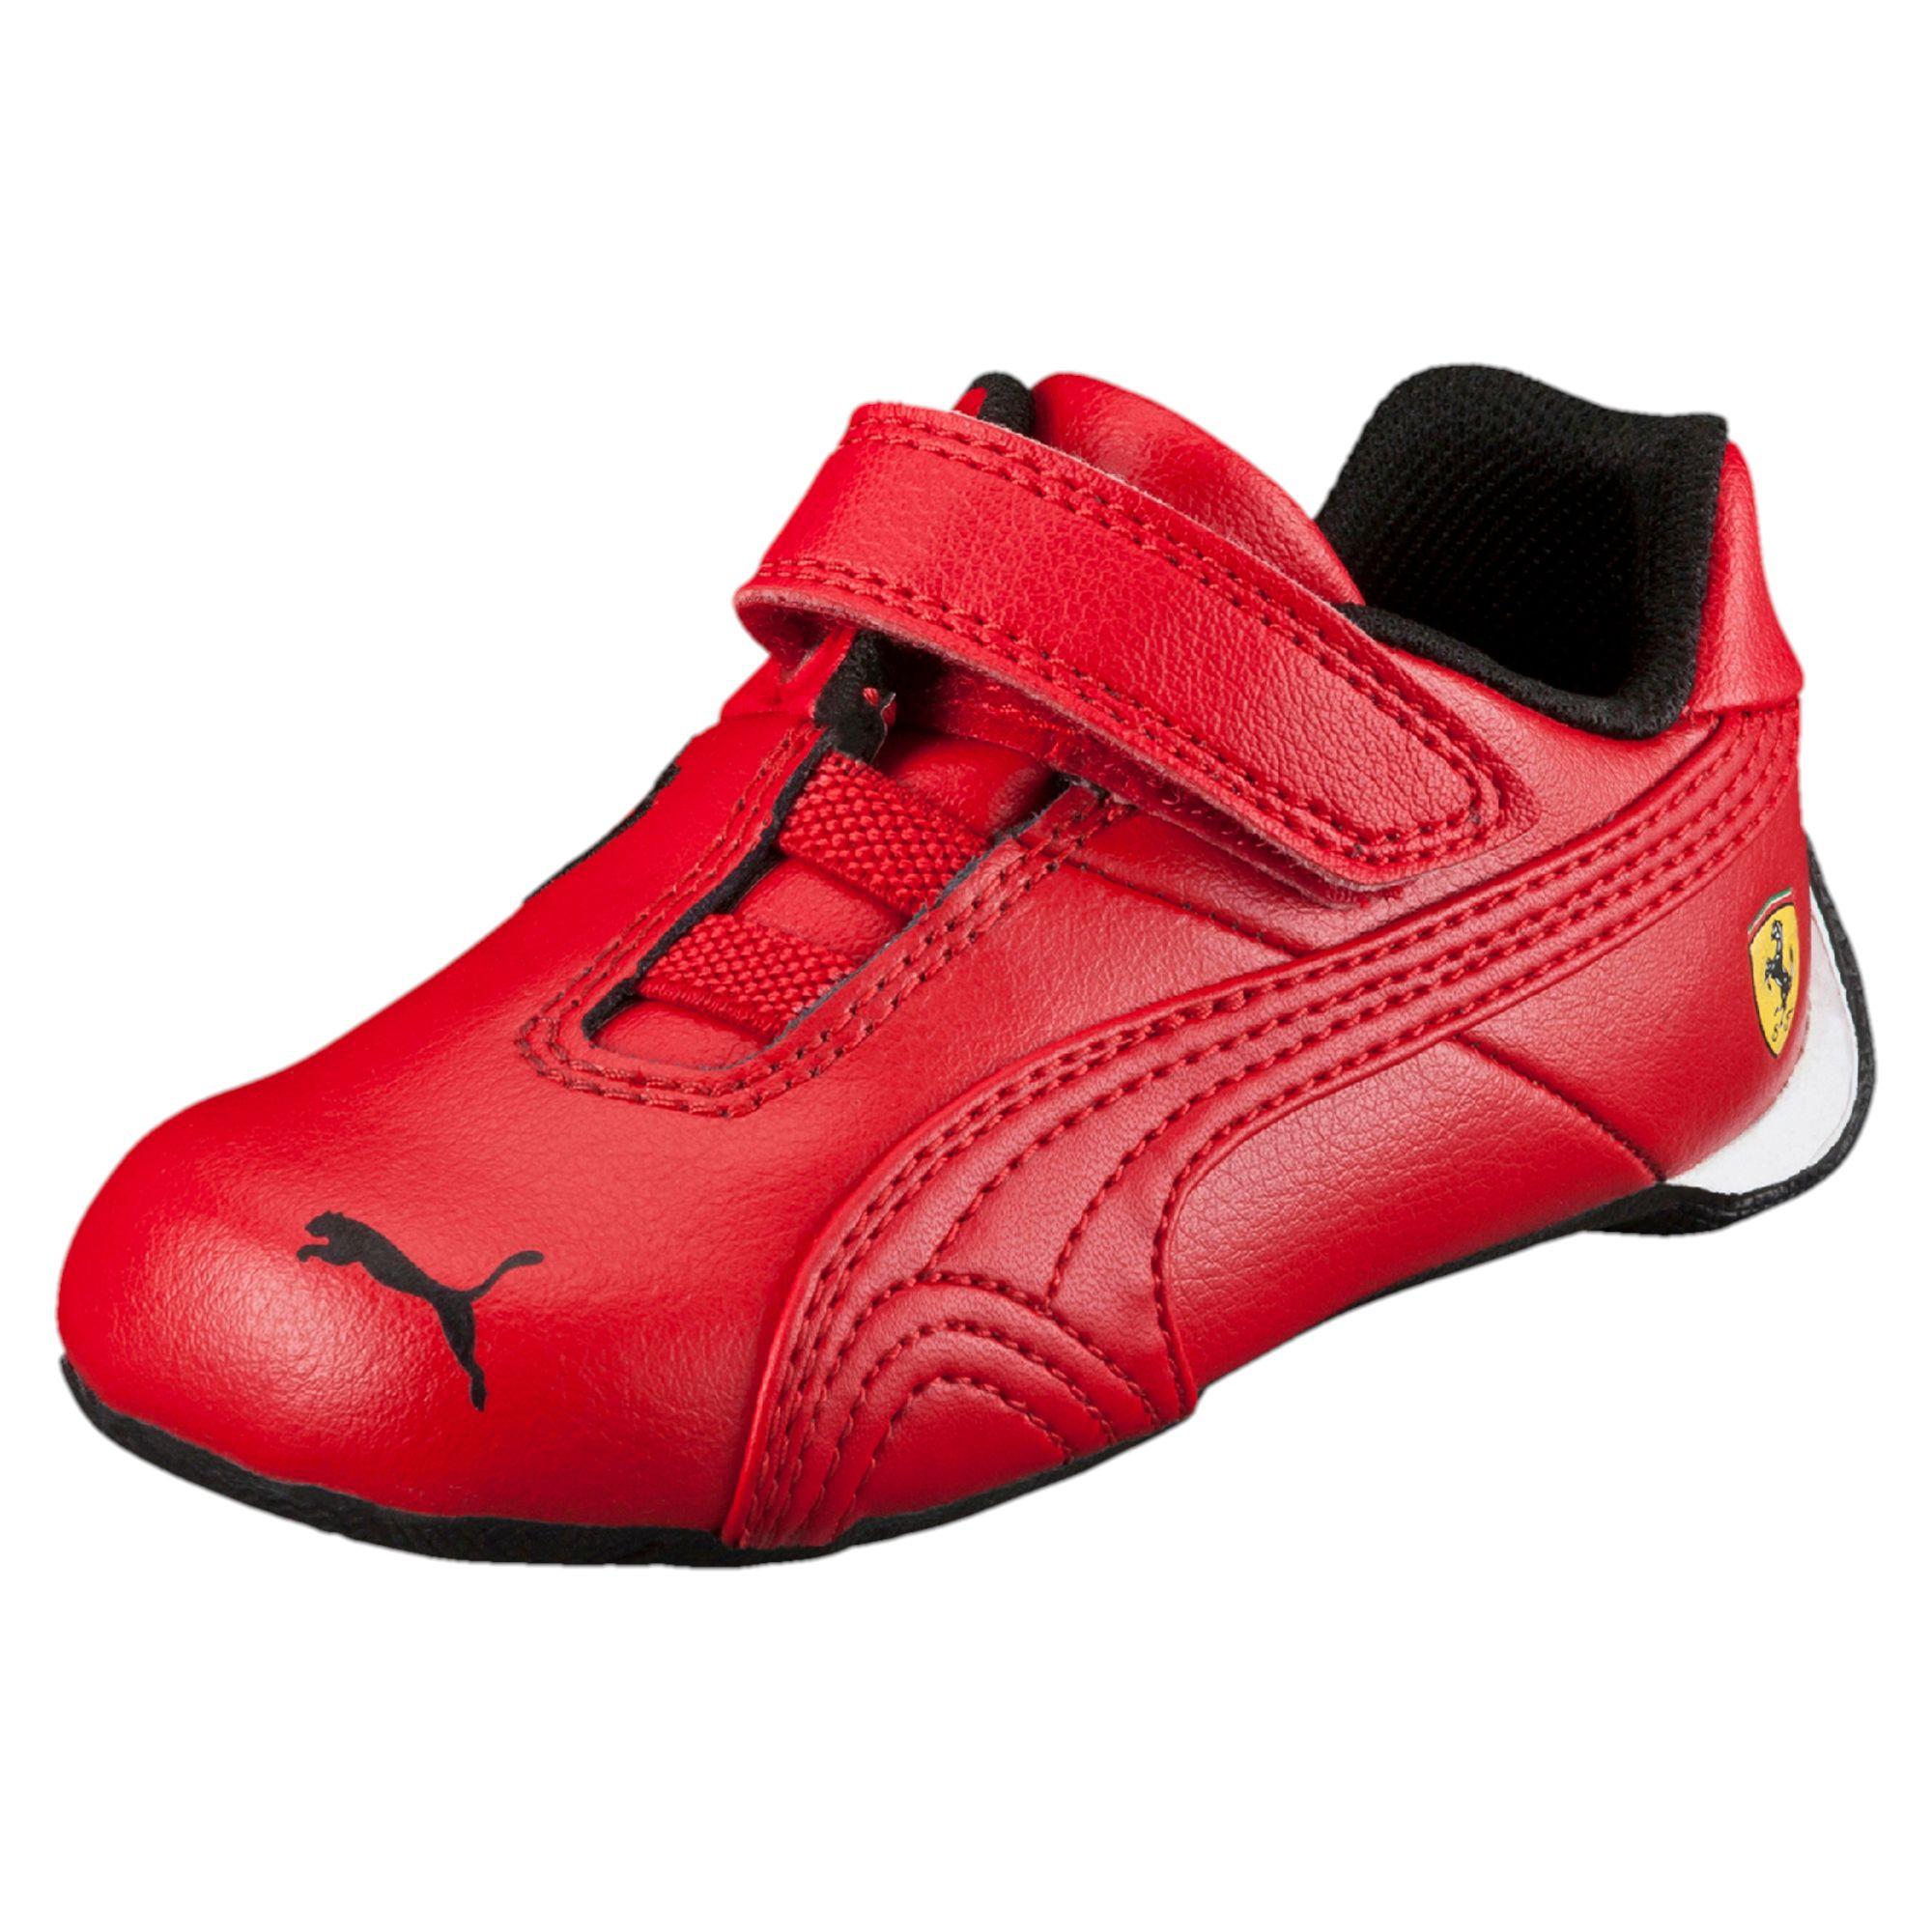 ferrari puma shoes for kids